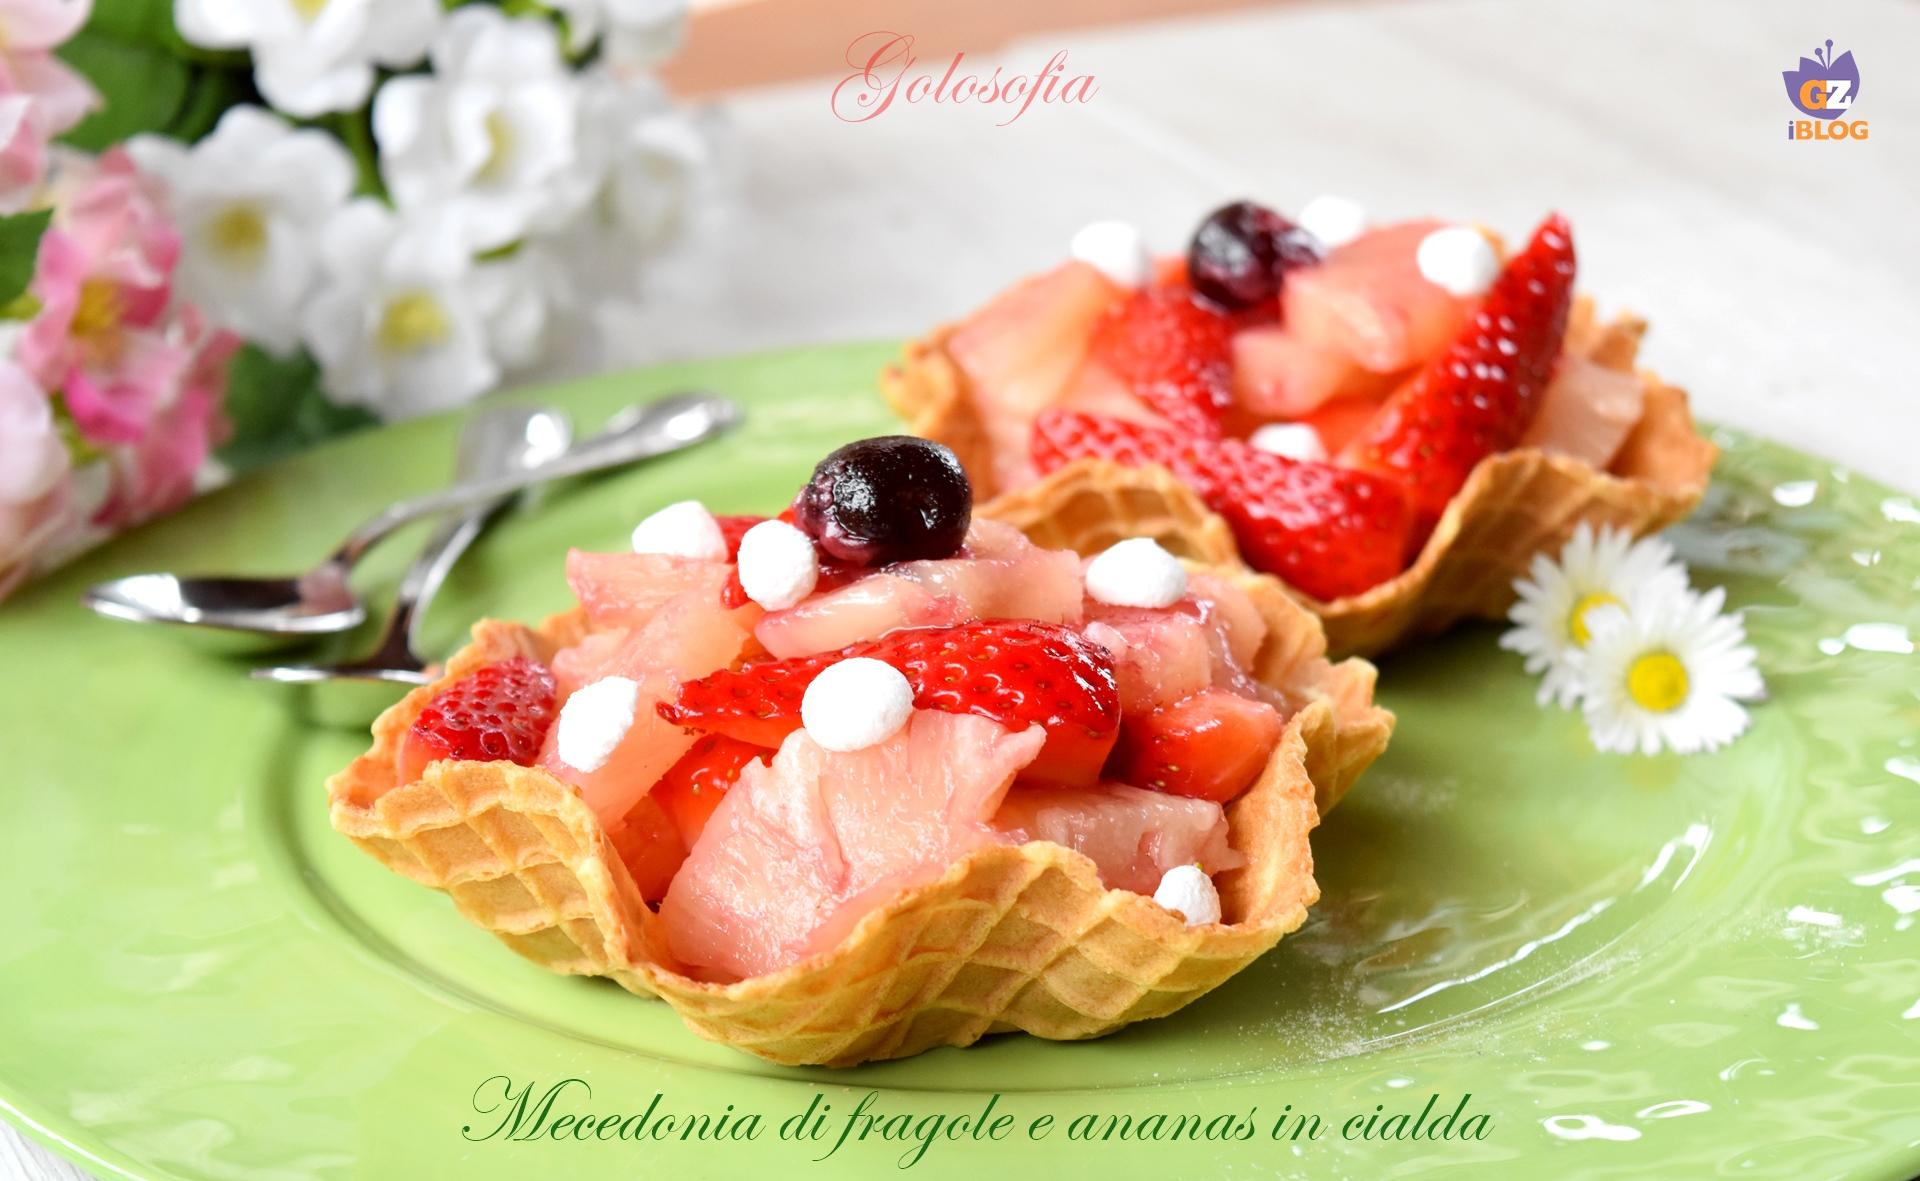 Macedonia di fragole e ananas-ricetta frutta e verdura-golosofia